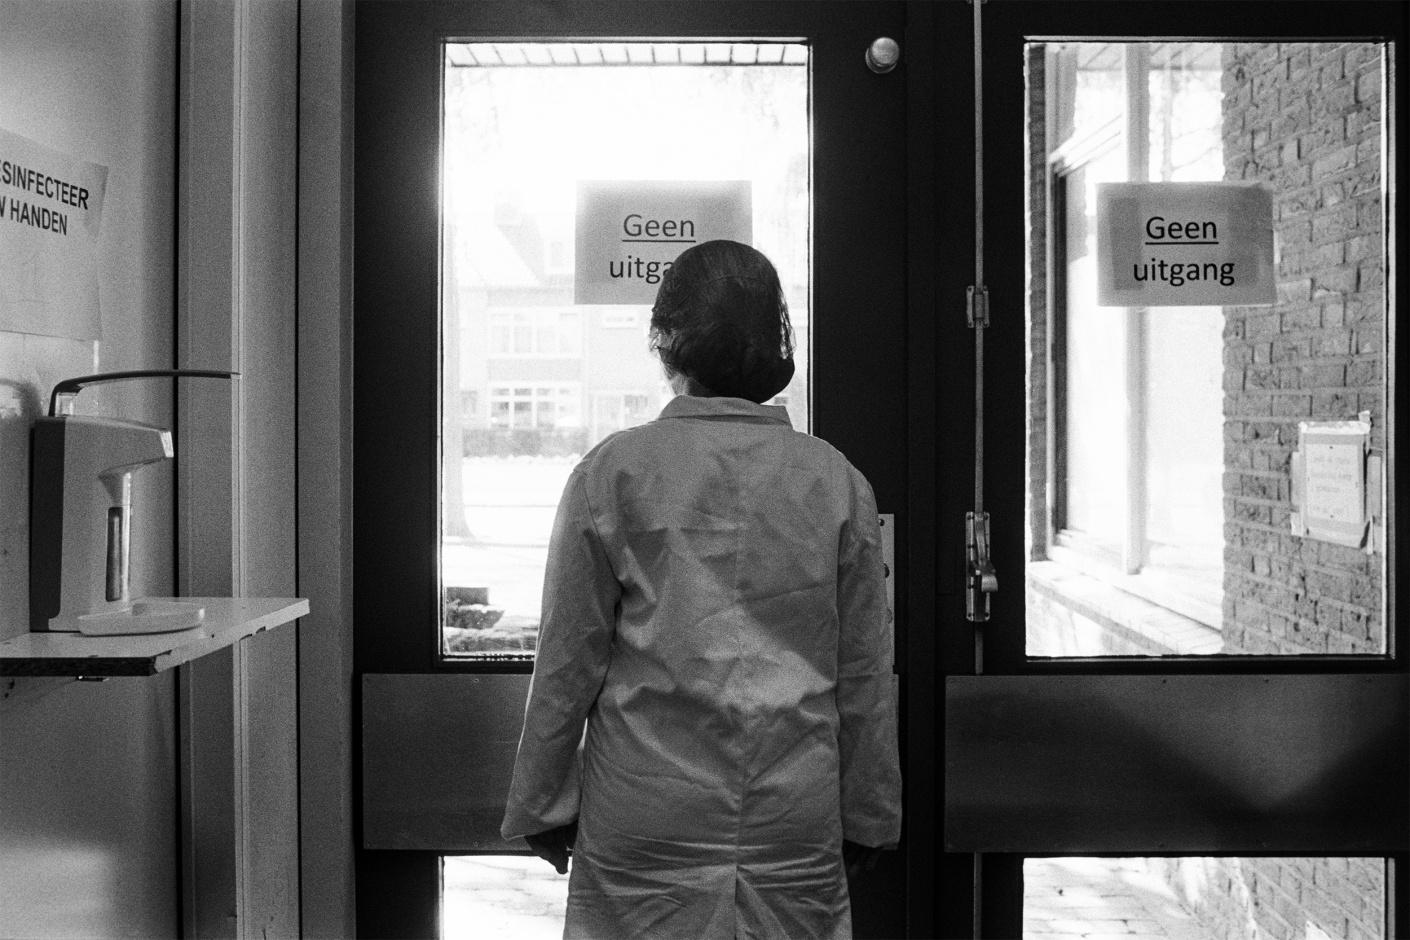 2 | CORONA | OPPENHEIM | Jelle Pieter de Boer